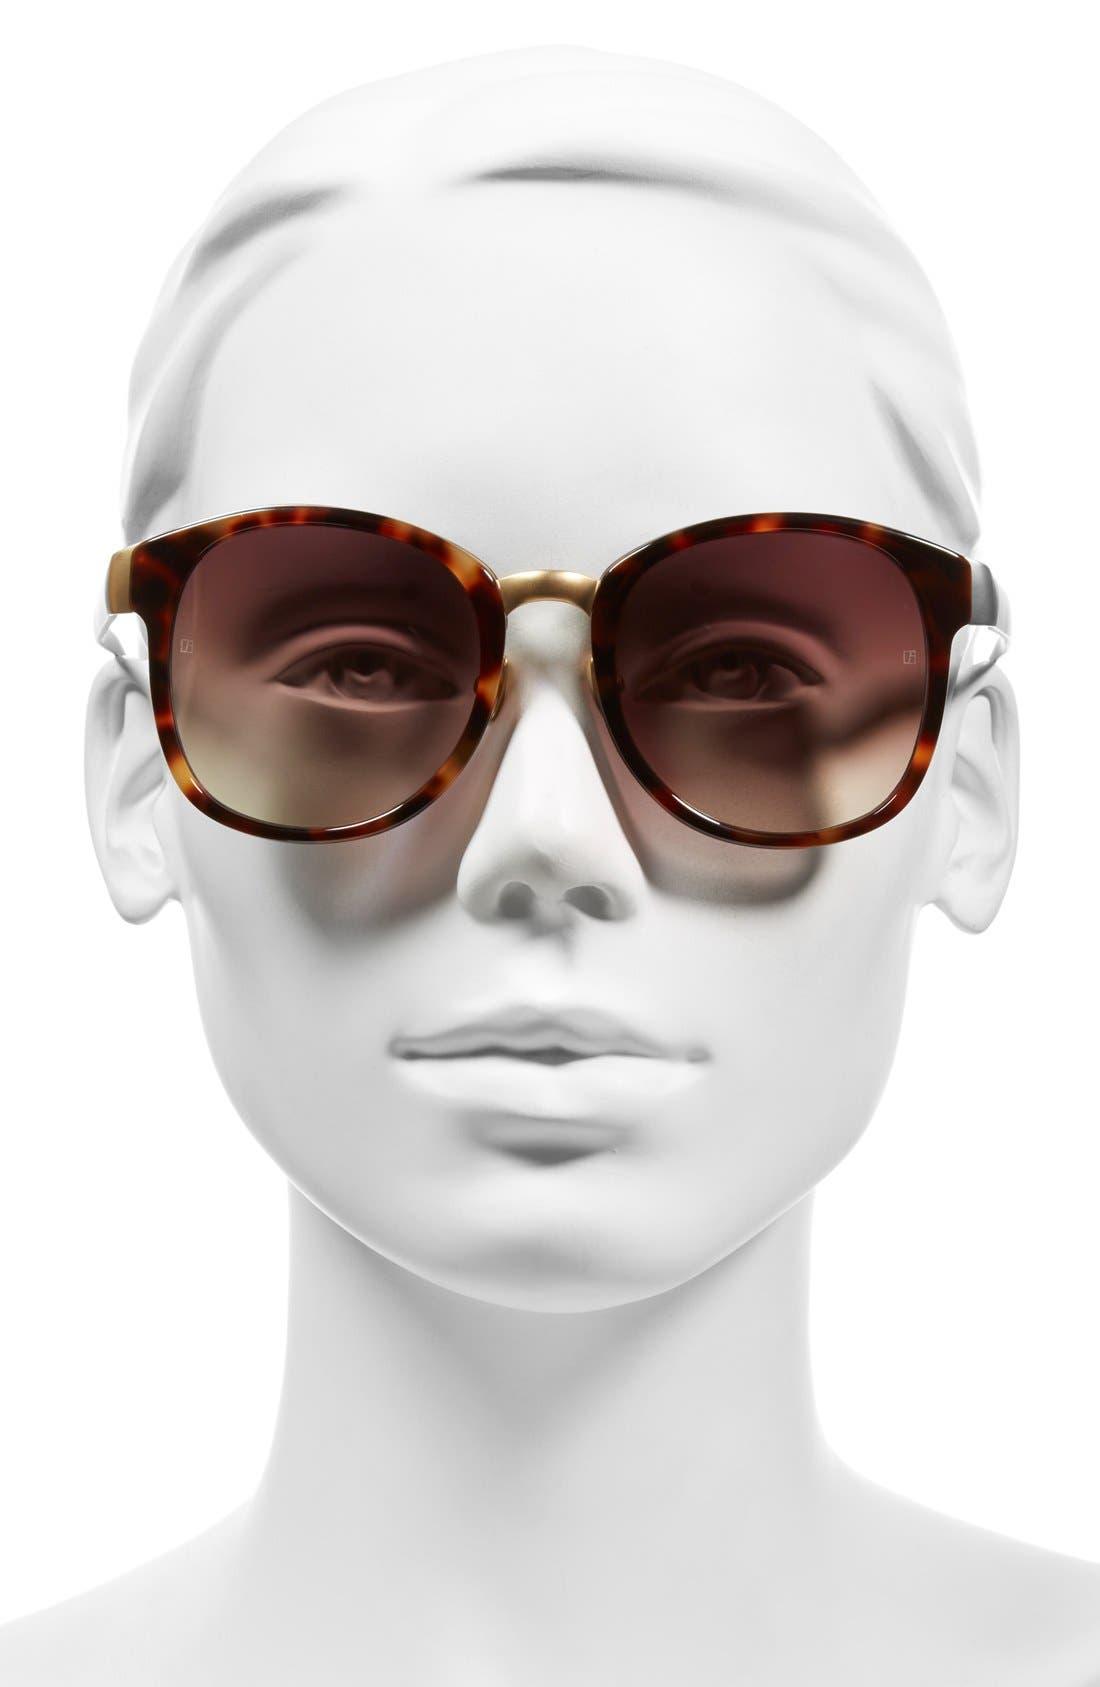 D-Frame 52mm 24 Karat Gold Trim Sunglasses,                             Alternate thumbnail 2, color,                             200